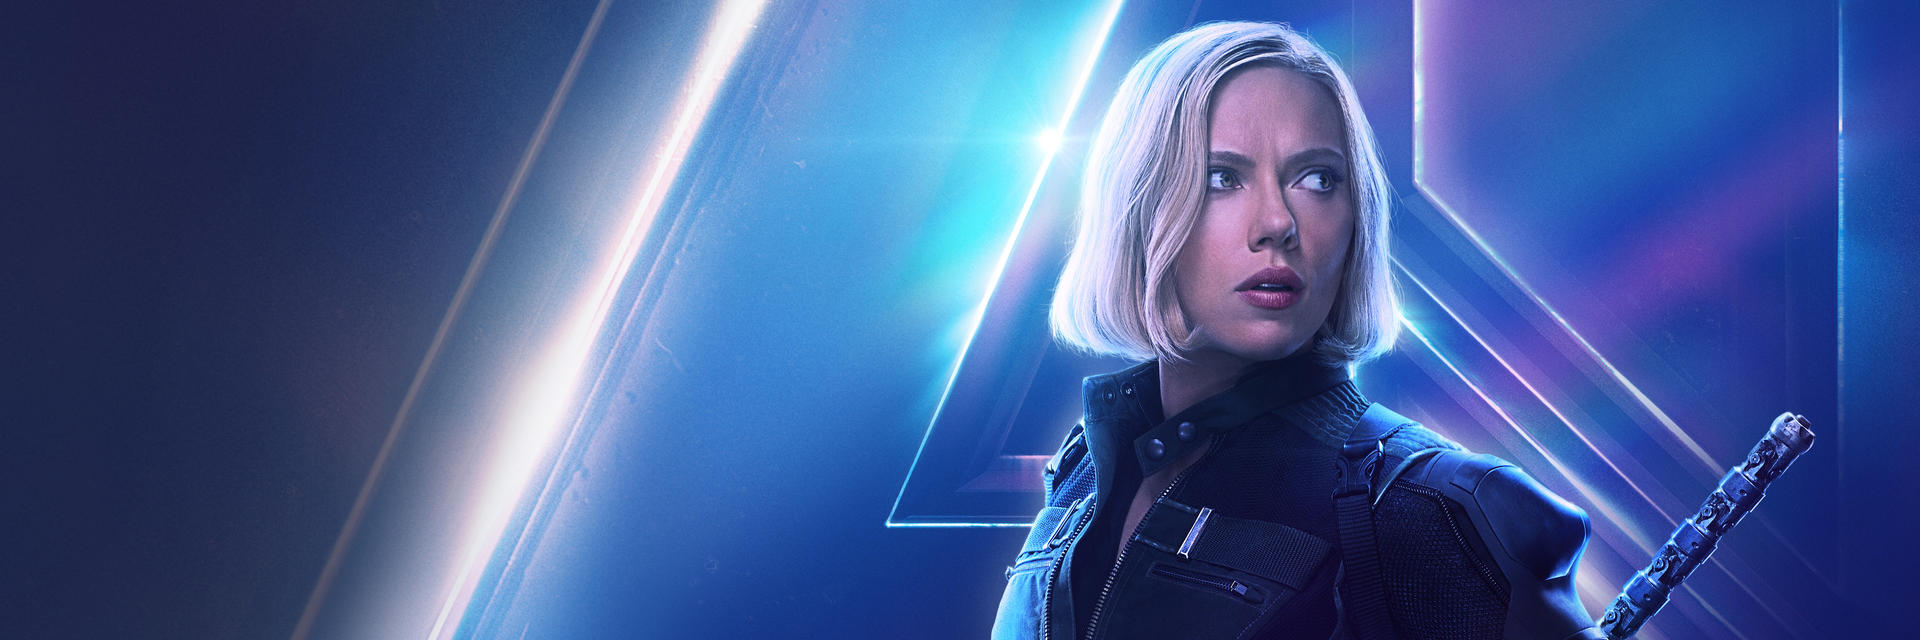 Black Widow Natasha Romanoff Characters Marvel